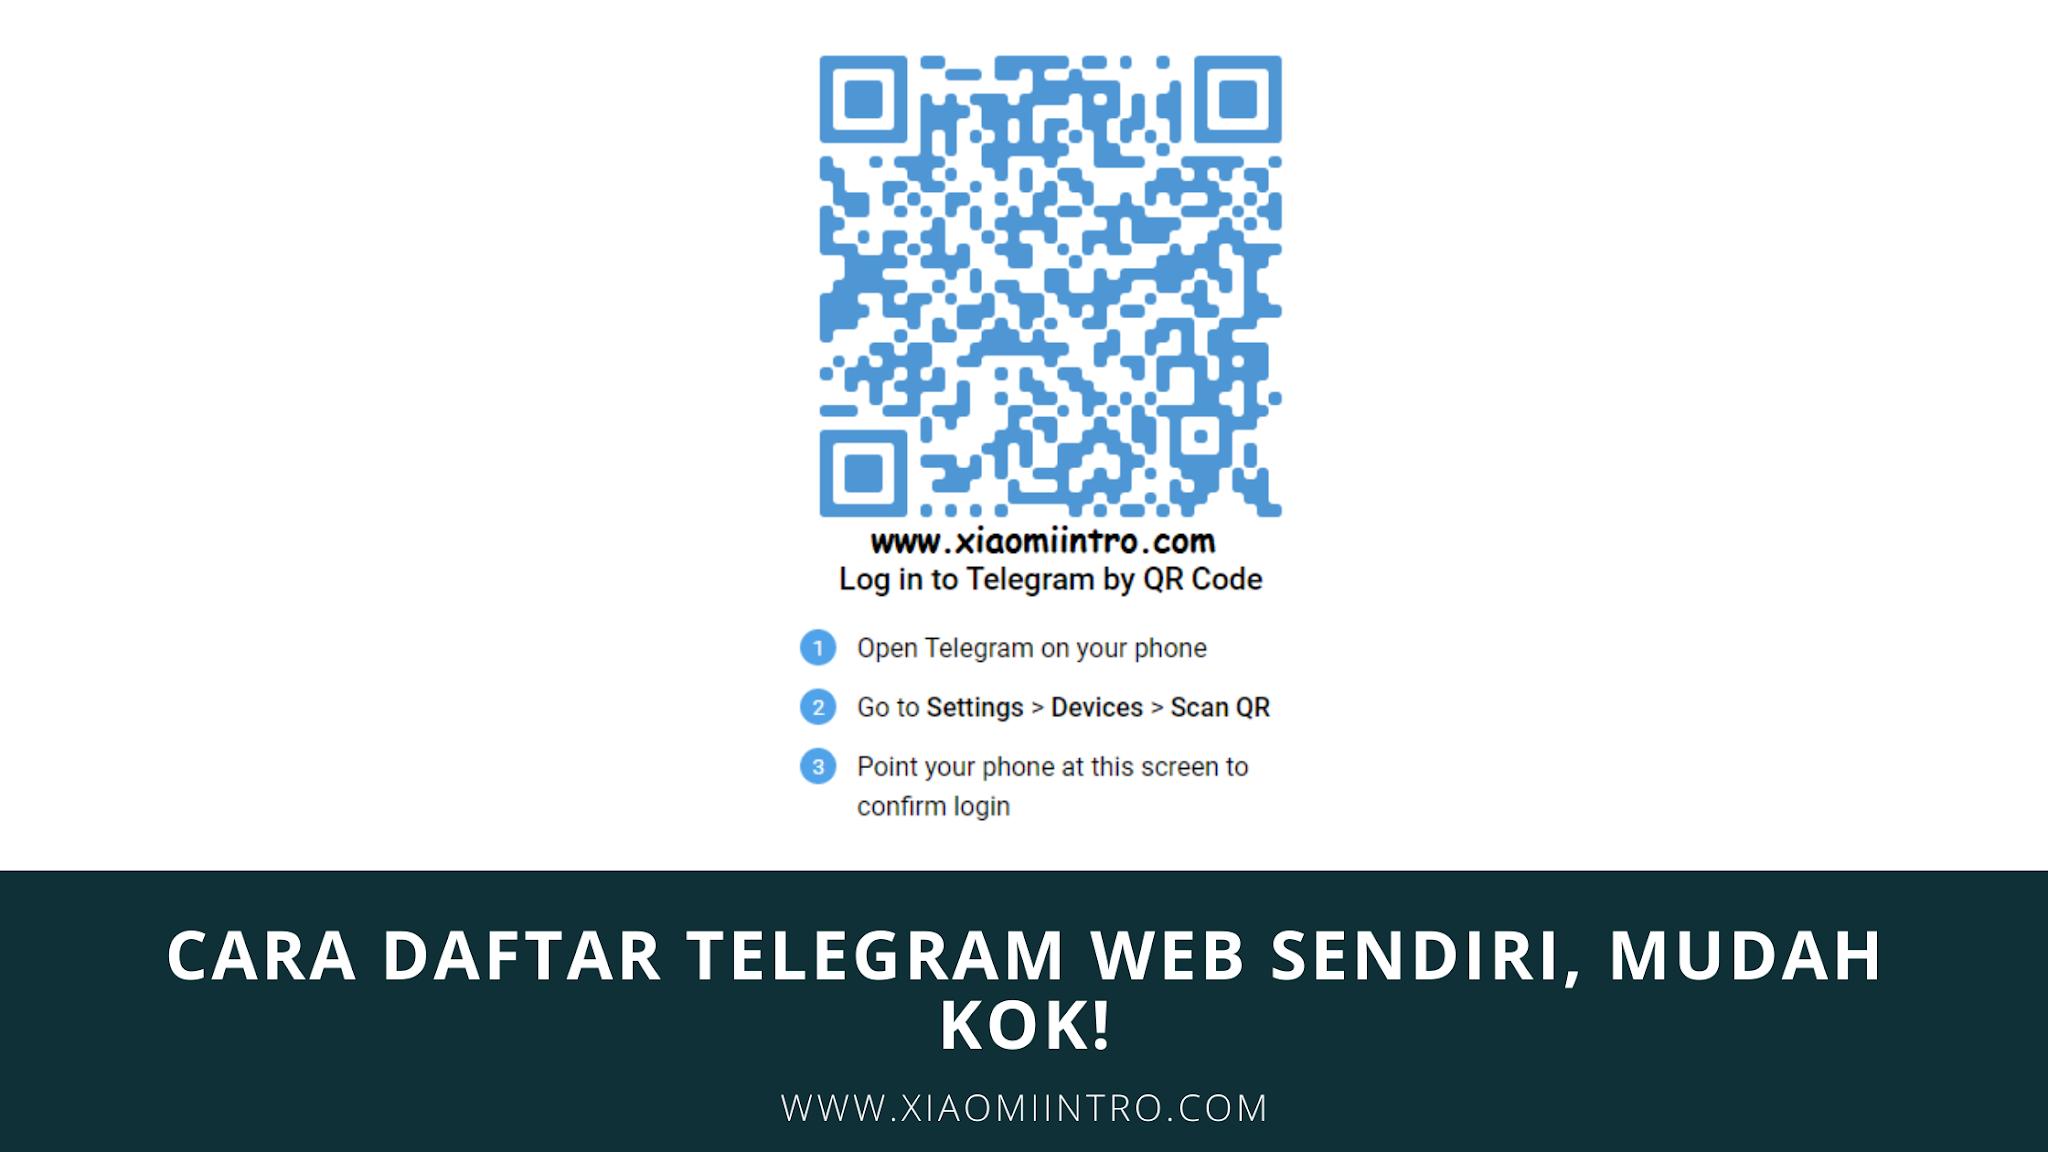 Cara Daftar Telegram Web Sendiri, Mudah Kok!